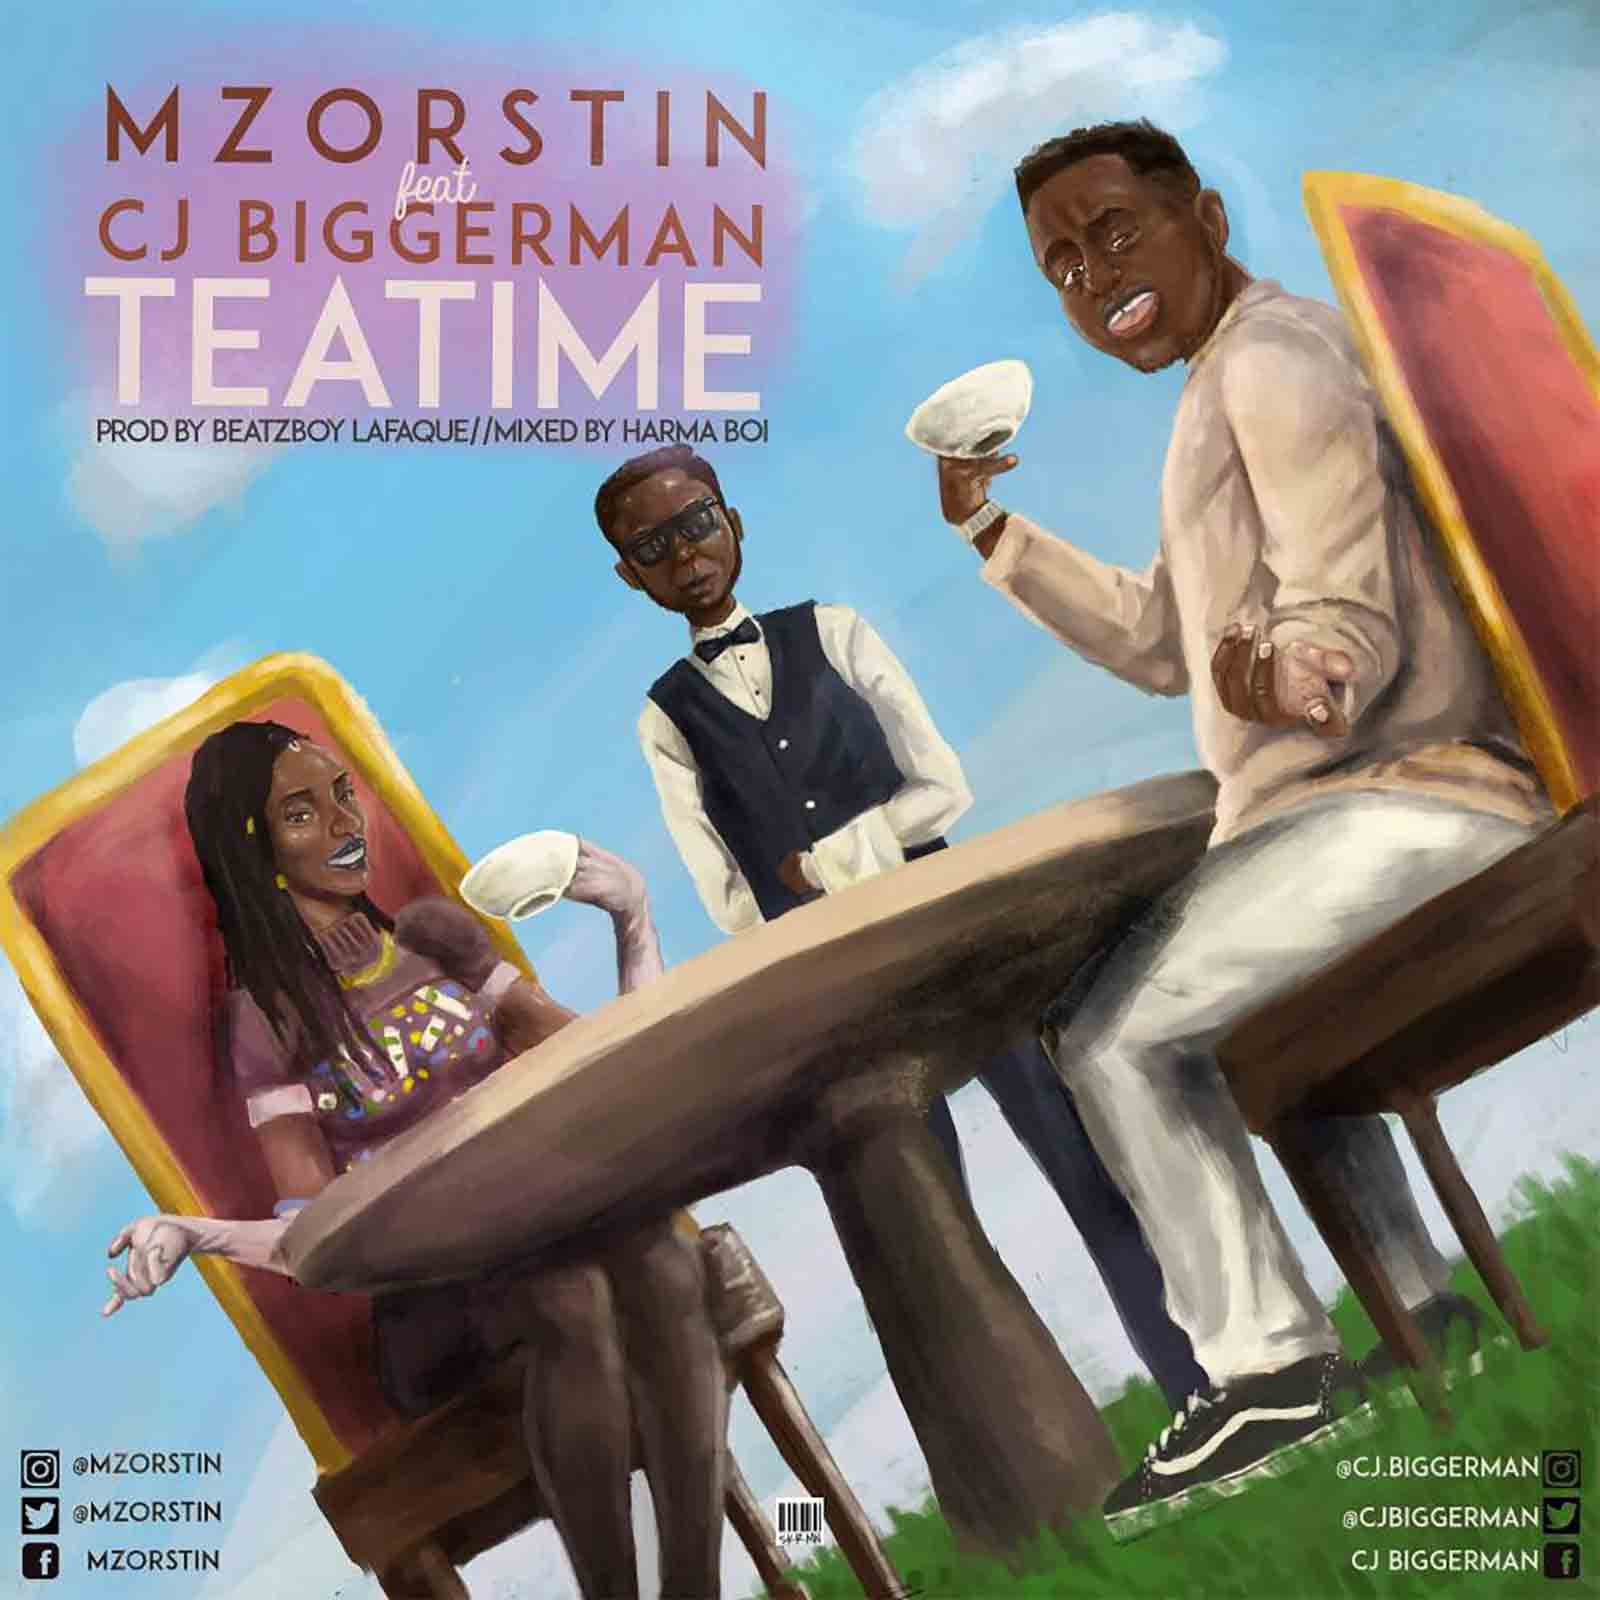 Tea Time by MzOrstin feat. CJ Biggerman